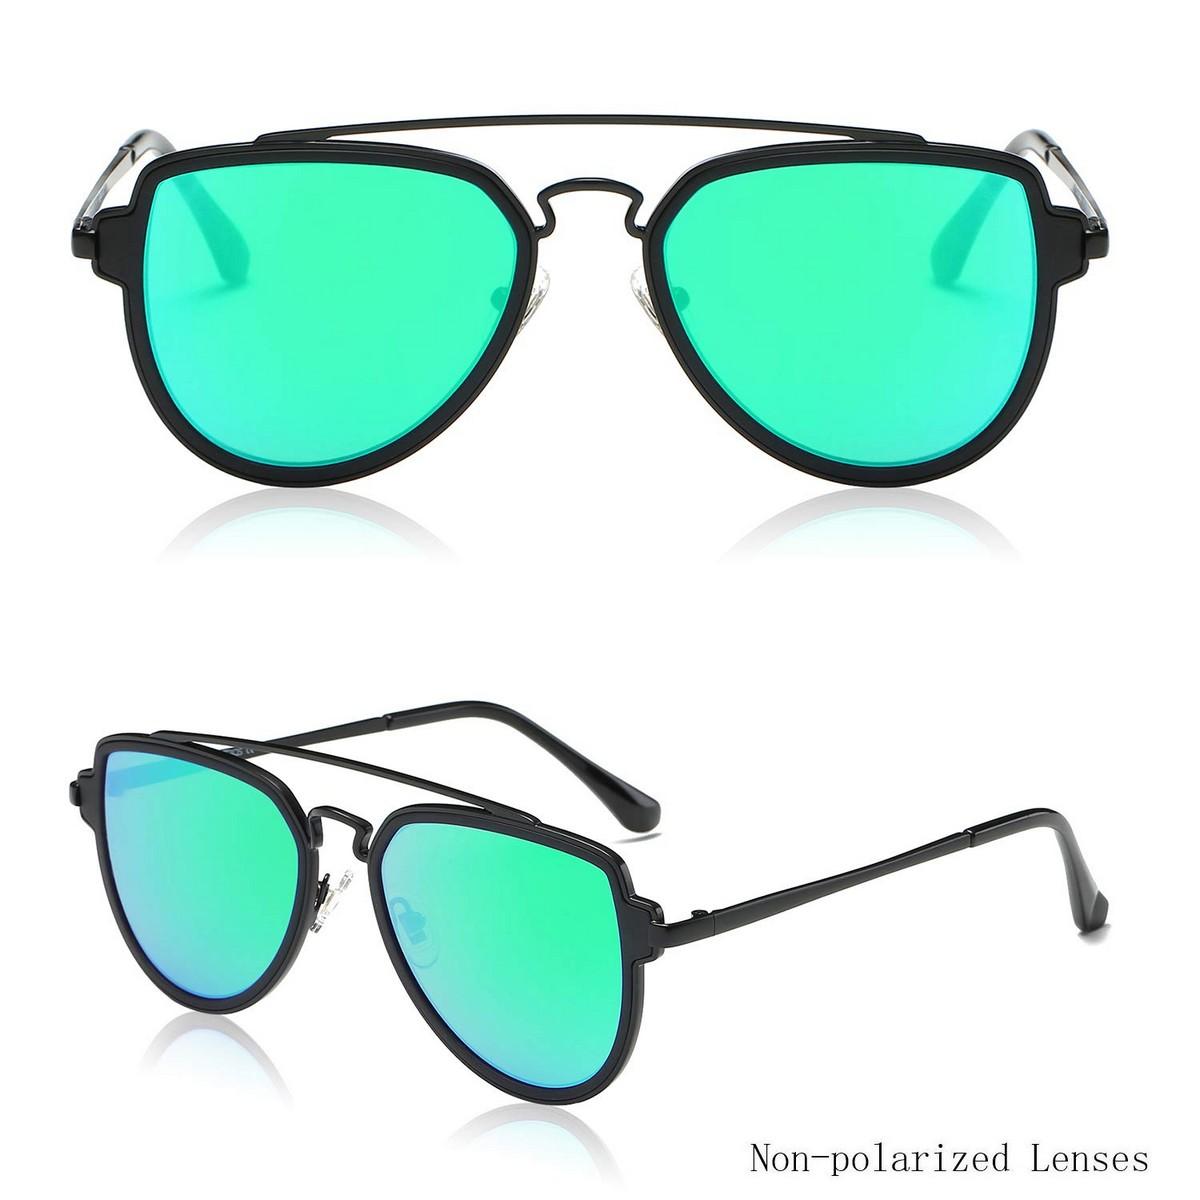 Double Bridge Matt Black Green Mirror Sunglasses